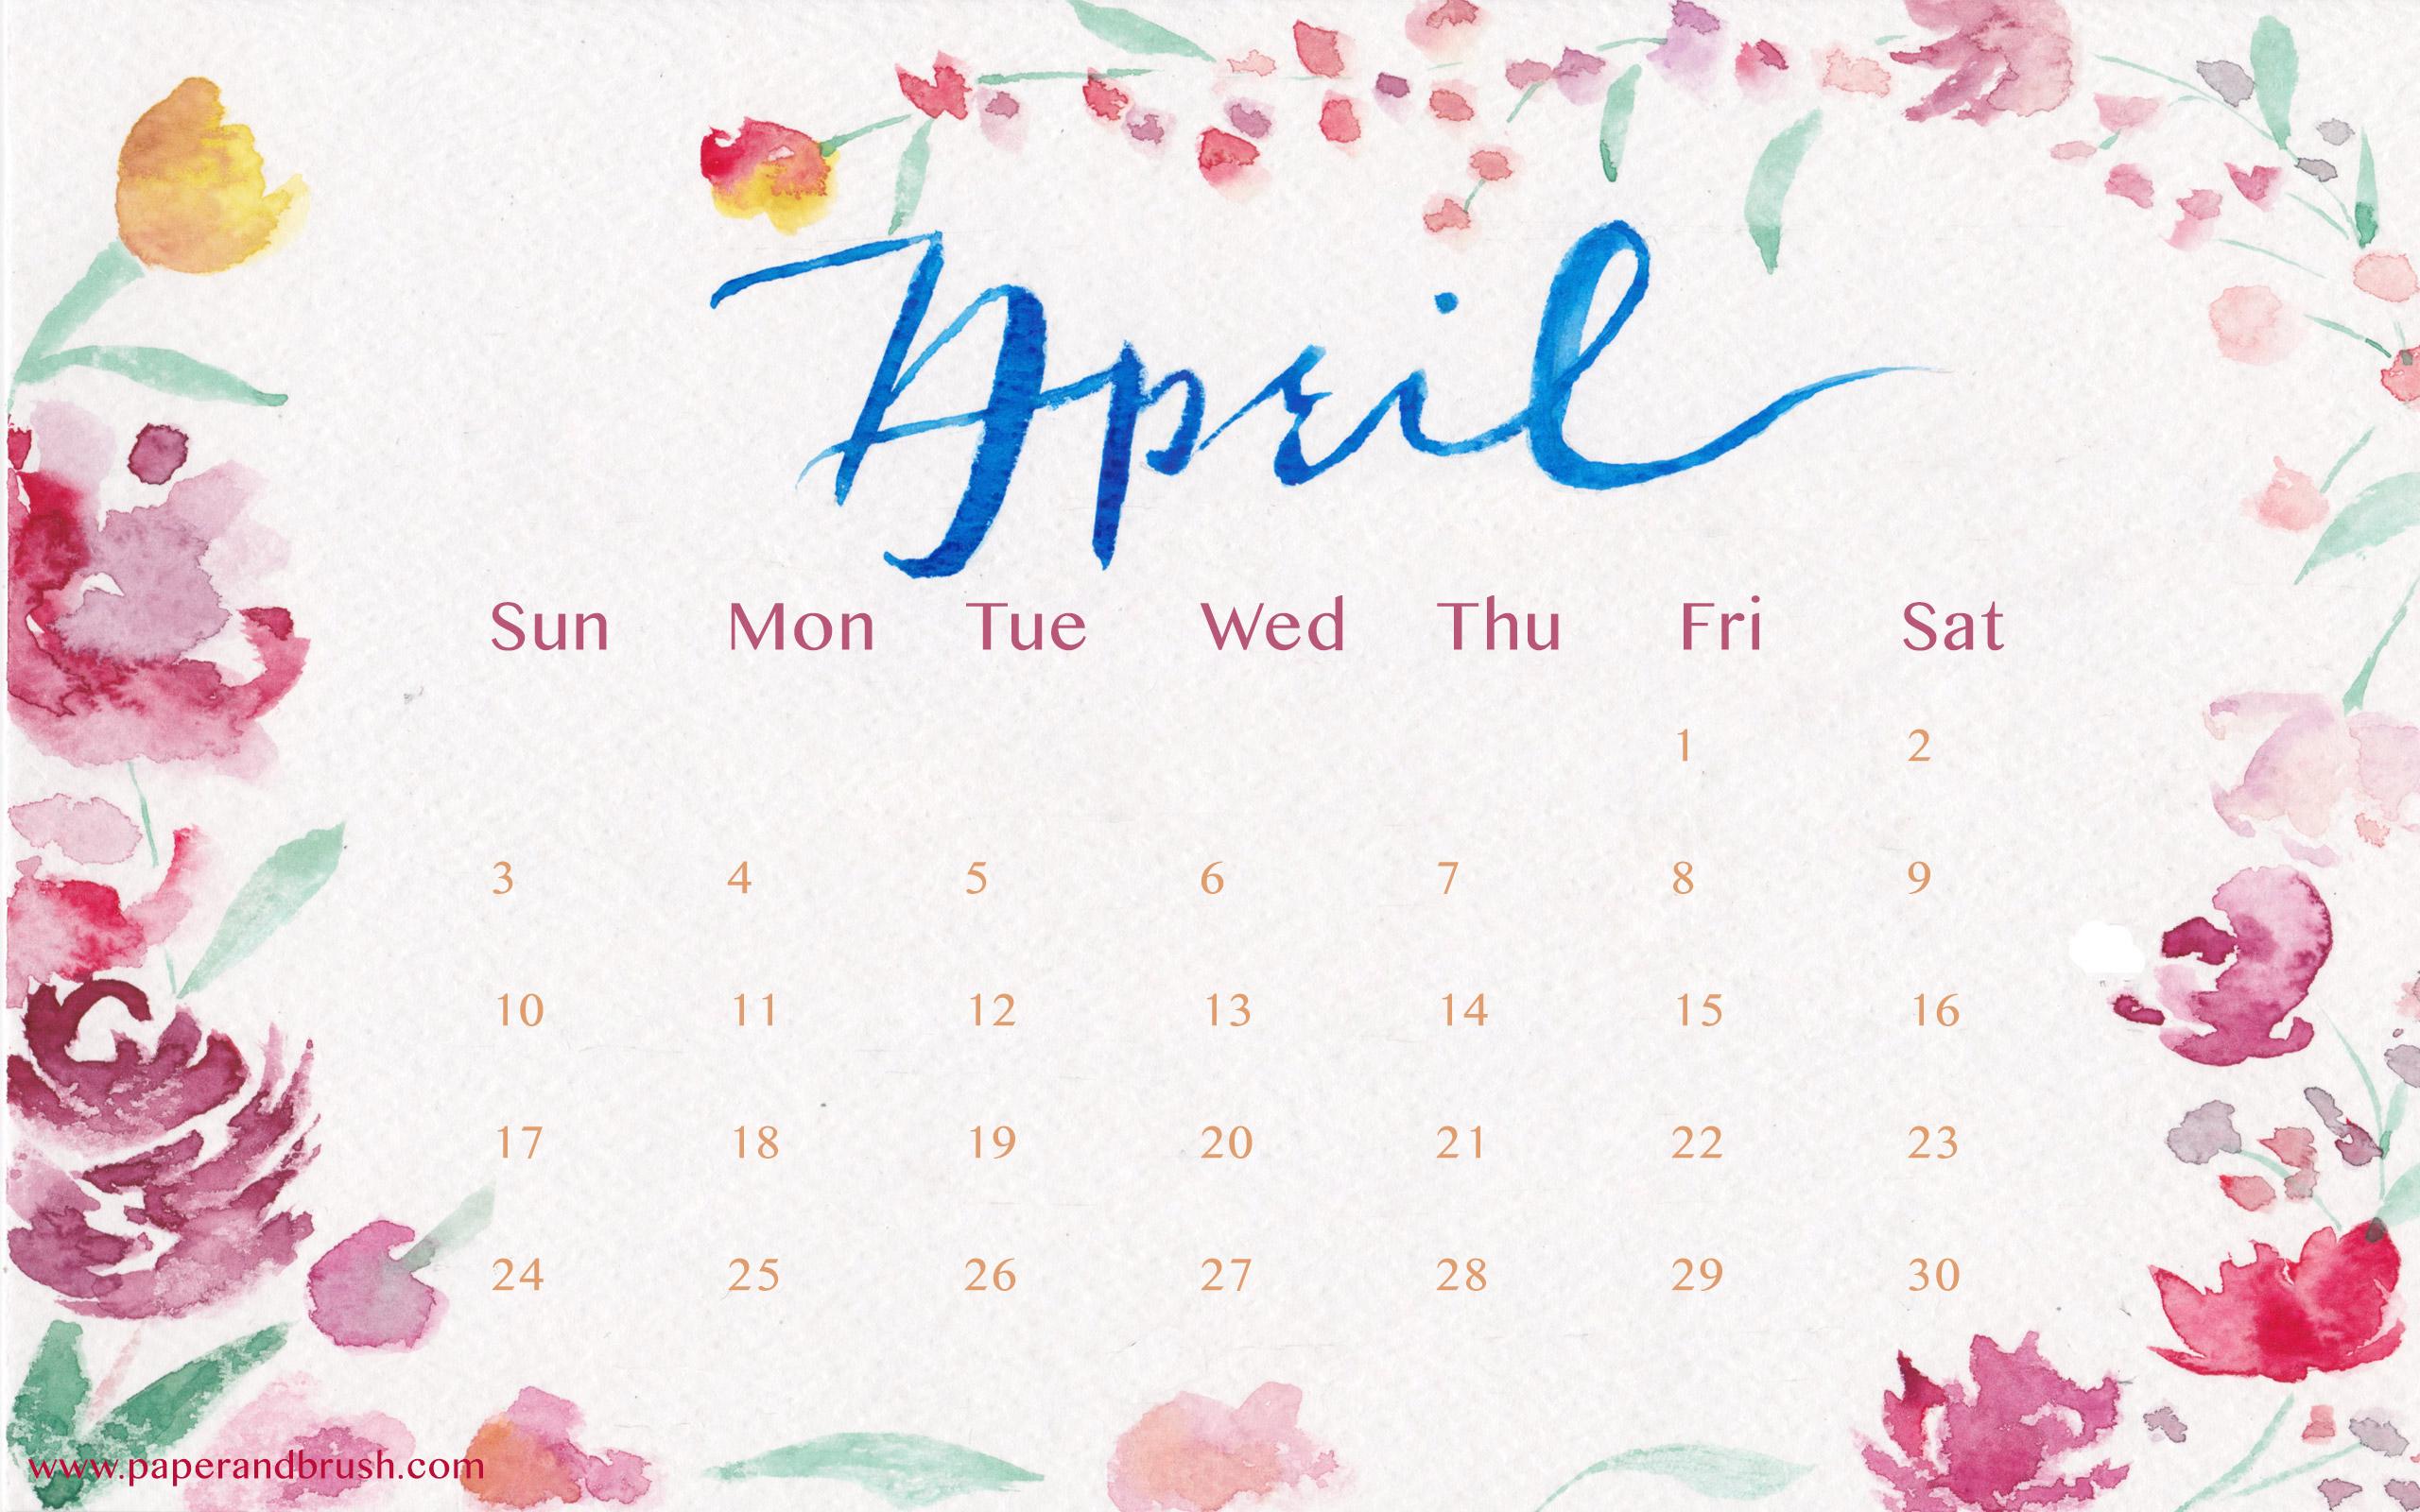 April 2016 Calendar Wallpaper   52DazheW Gallery 2560x1600